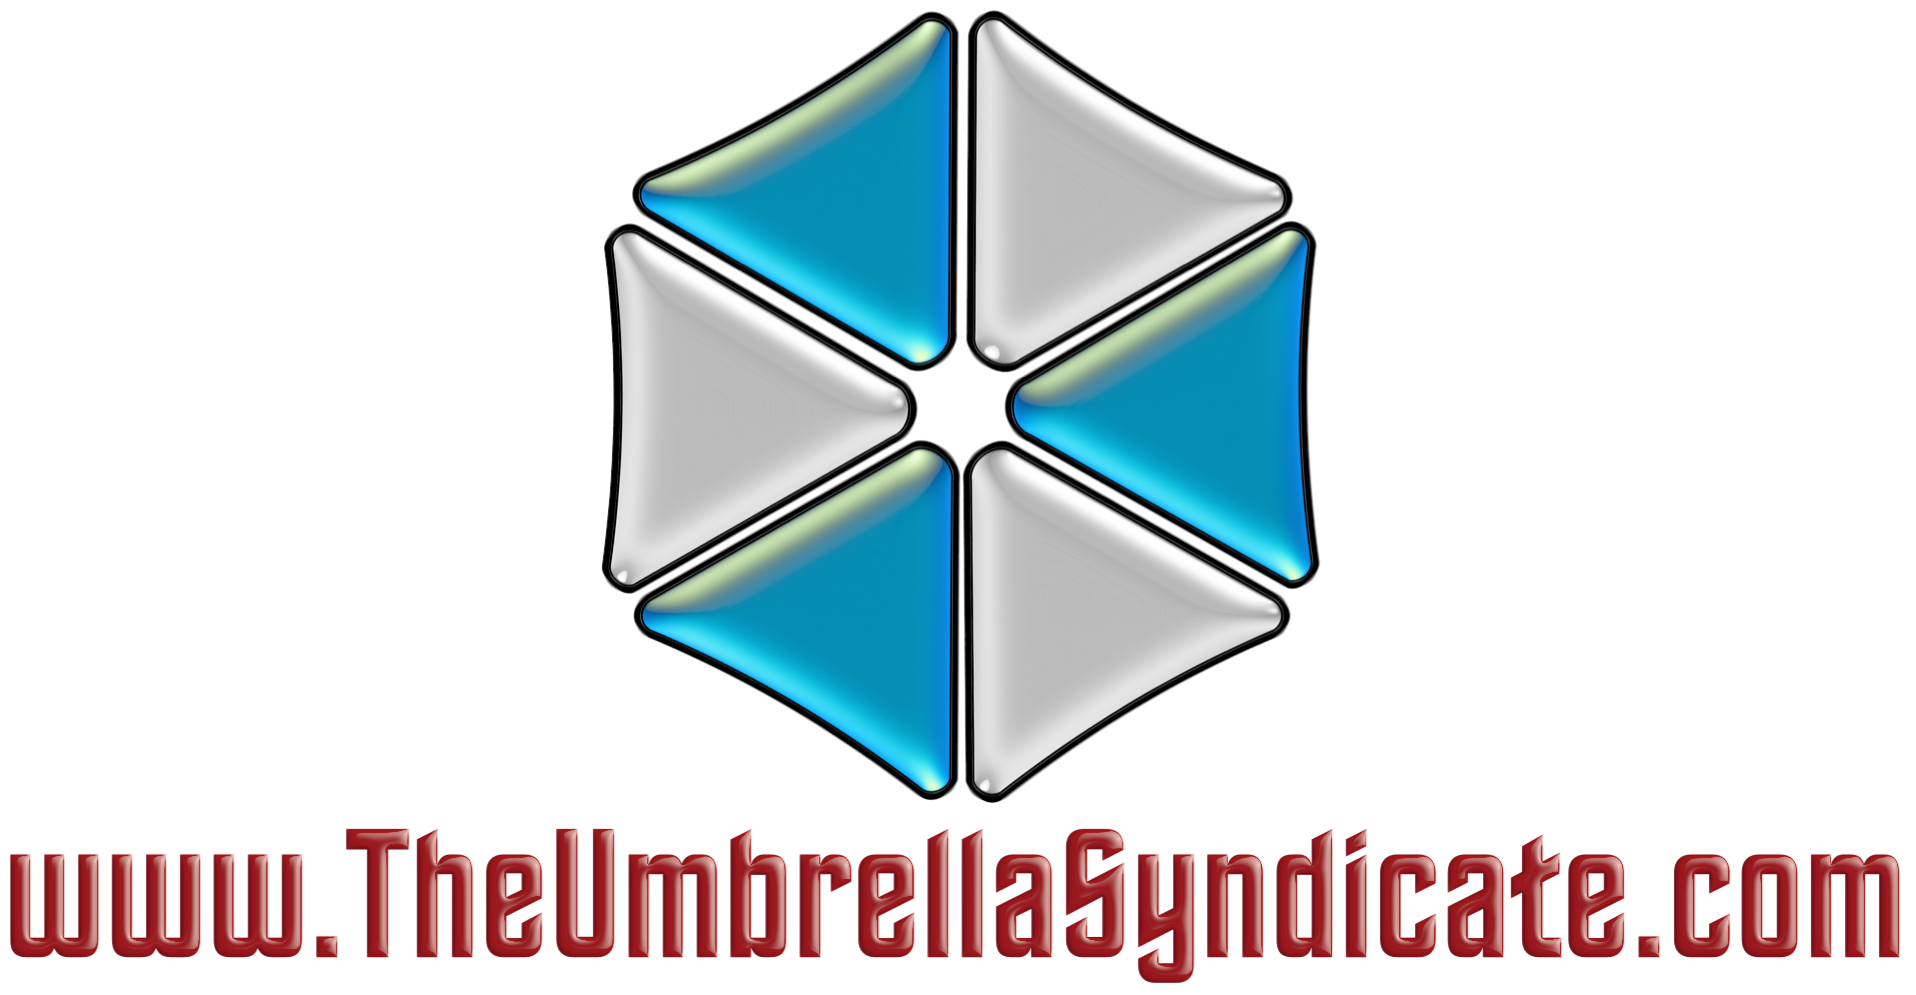 The Umbrella Syndicate